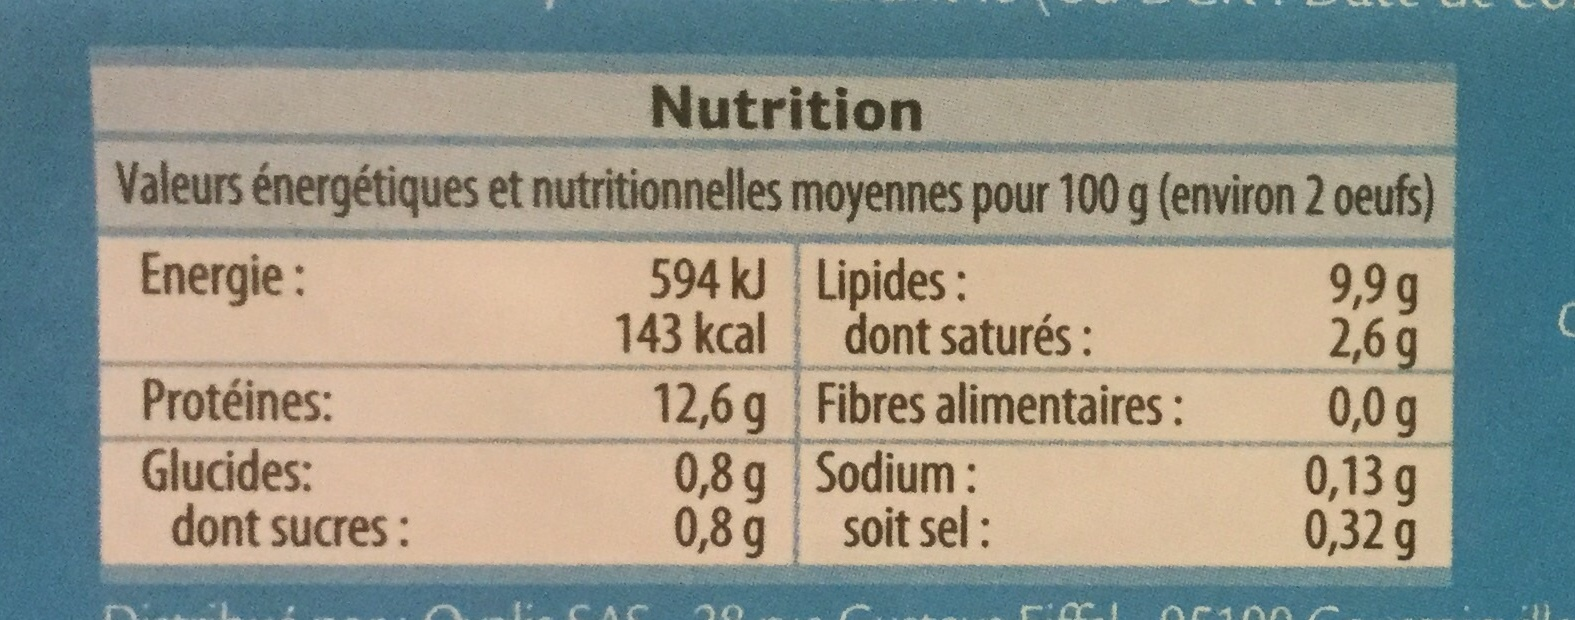 Oeufs plein air - Informations nutritionnelles - fr